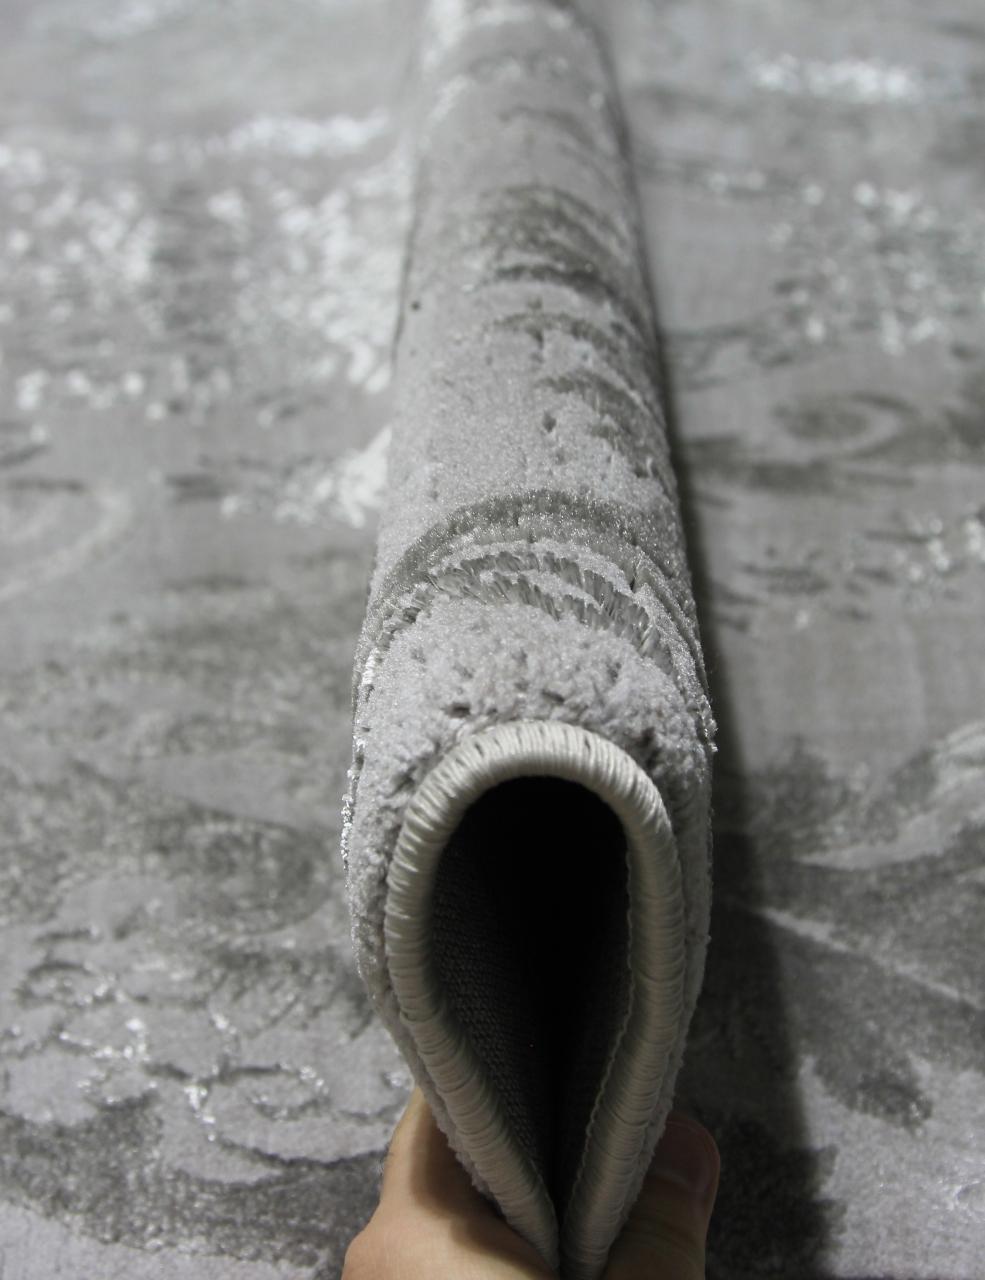 Ковер 16804 - 096 - Овал - коллекция Elite - фото 2